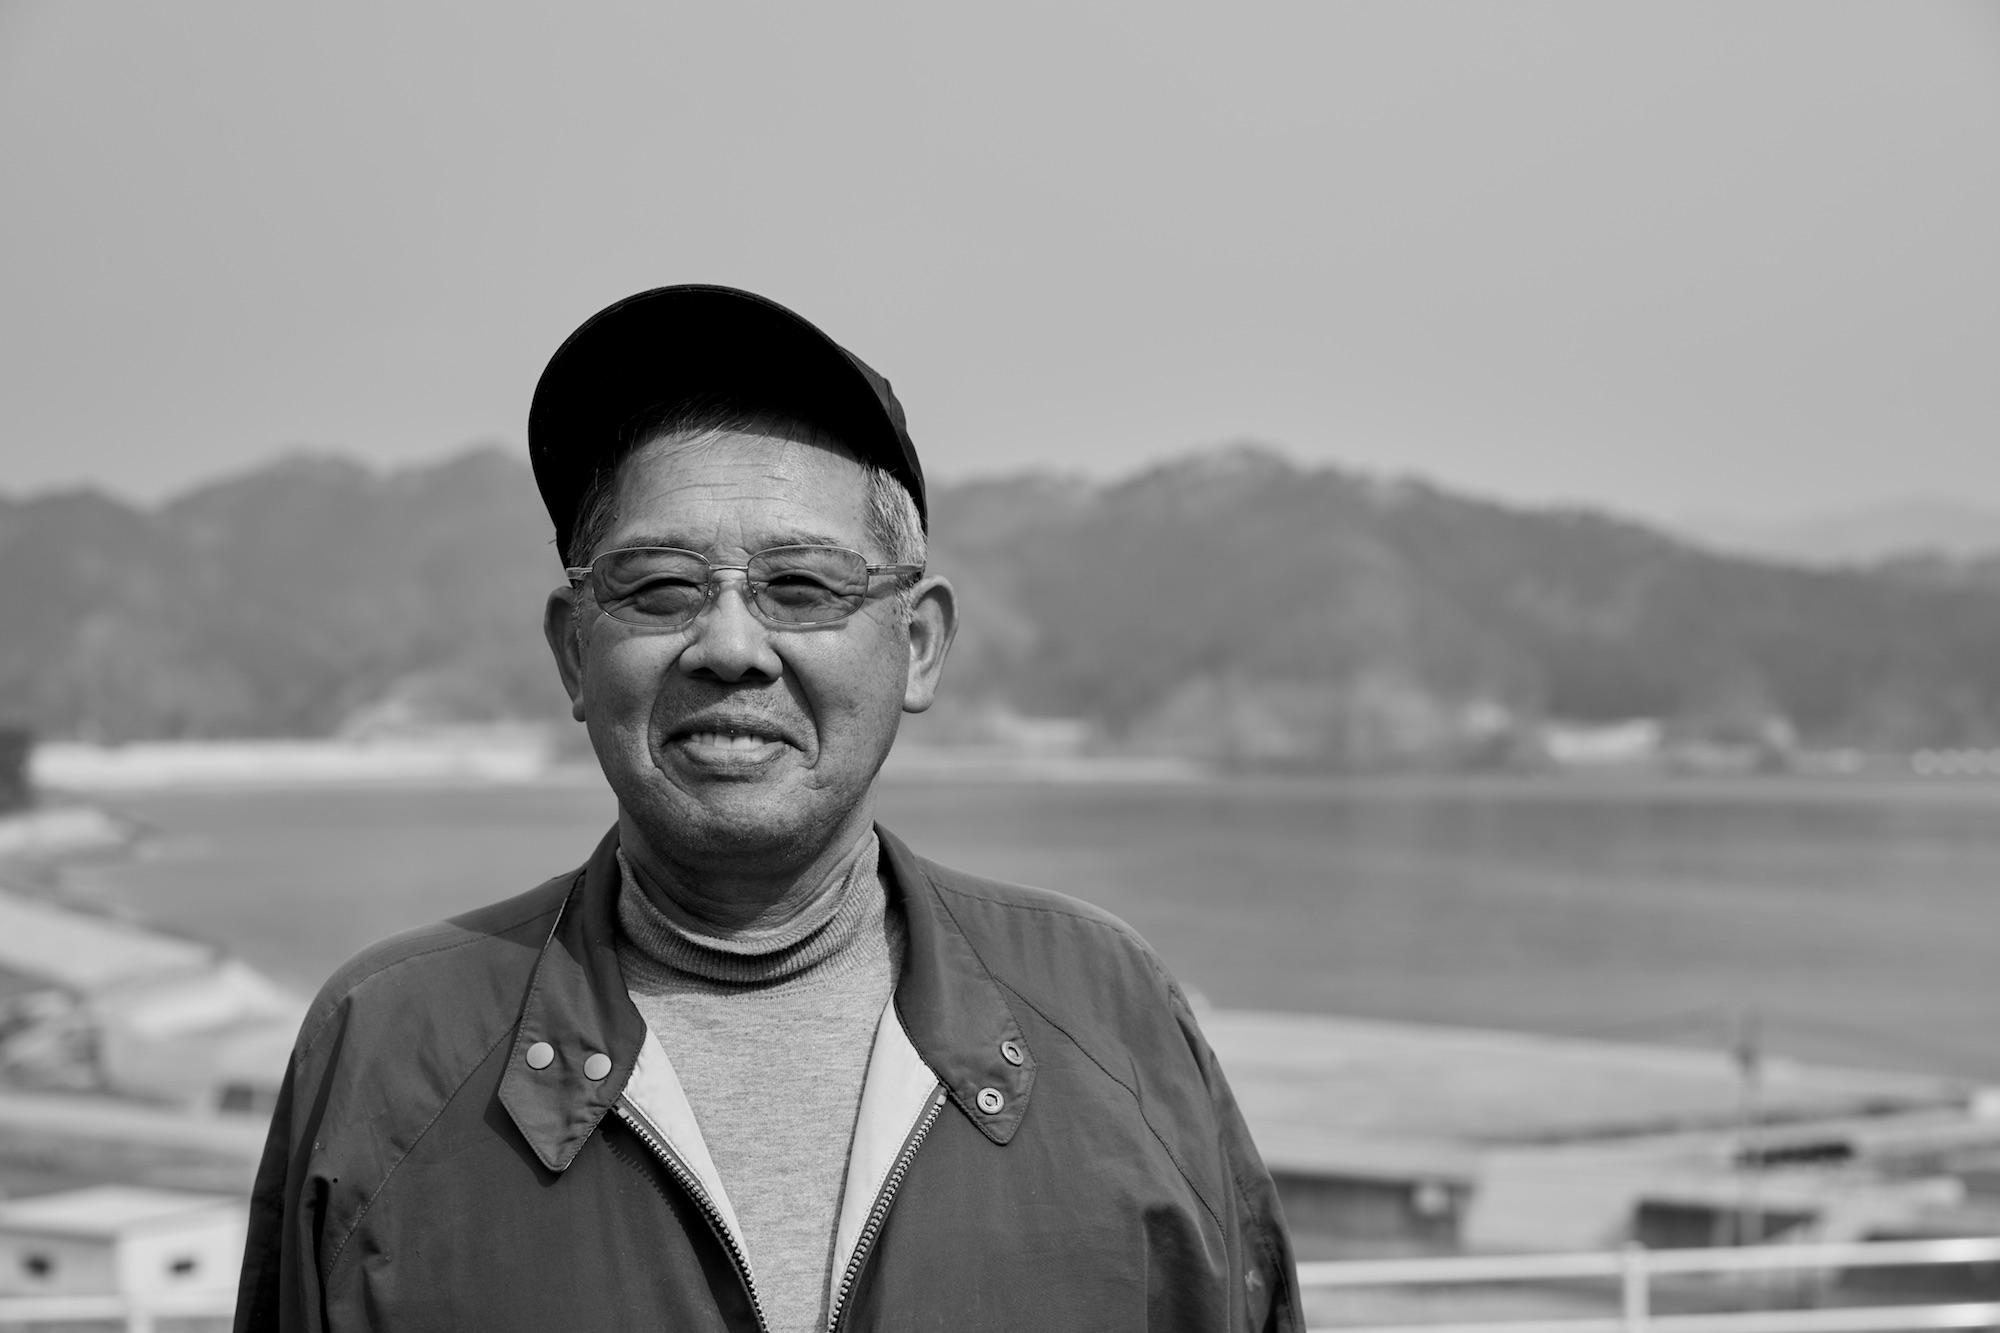 Shoschichi Maekawa (前川昭七), a local fisherman, who lost his daughter in the disaster